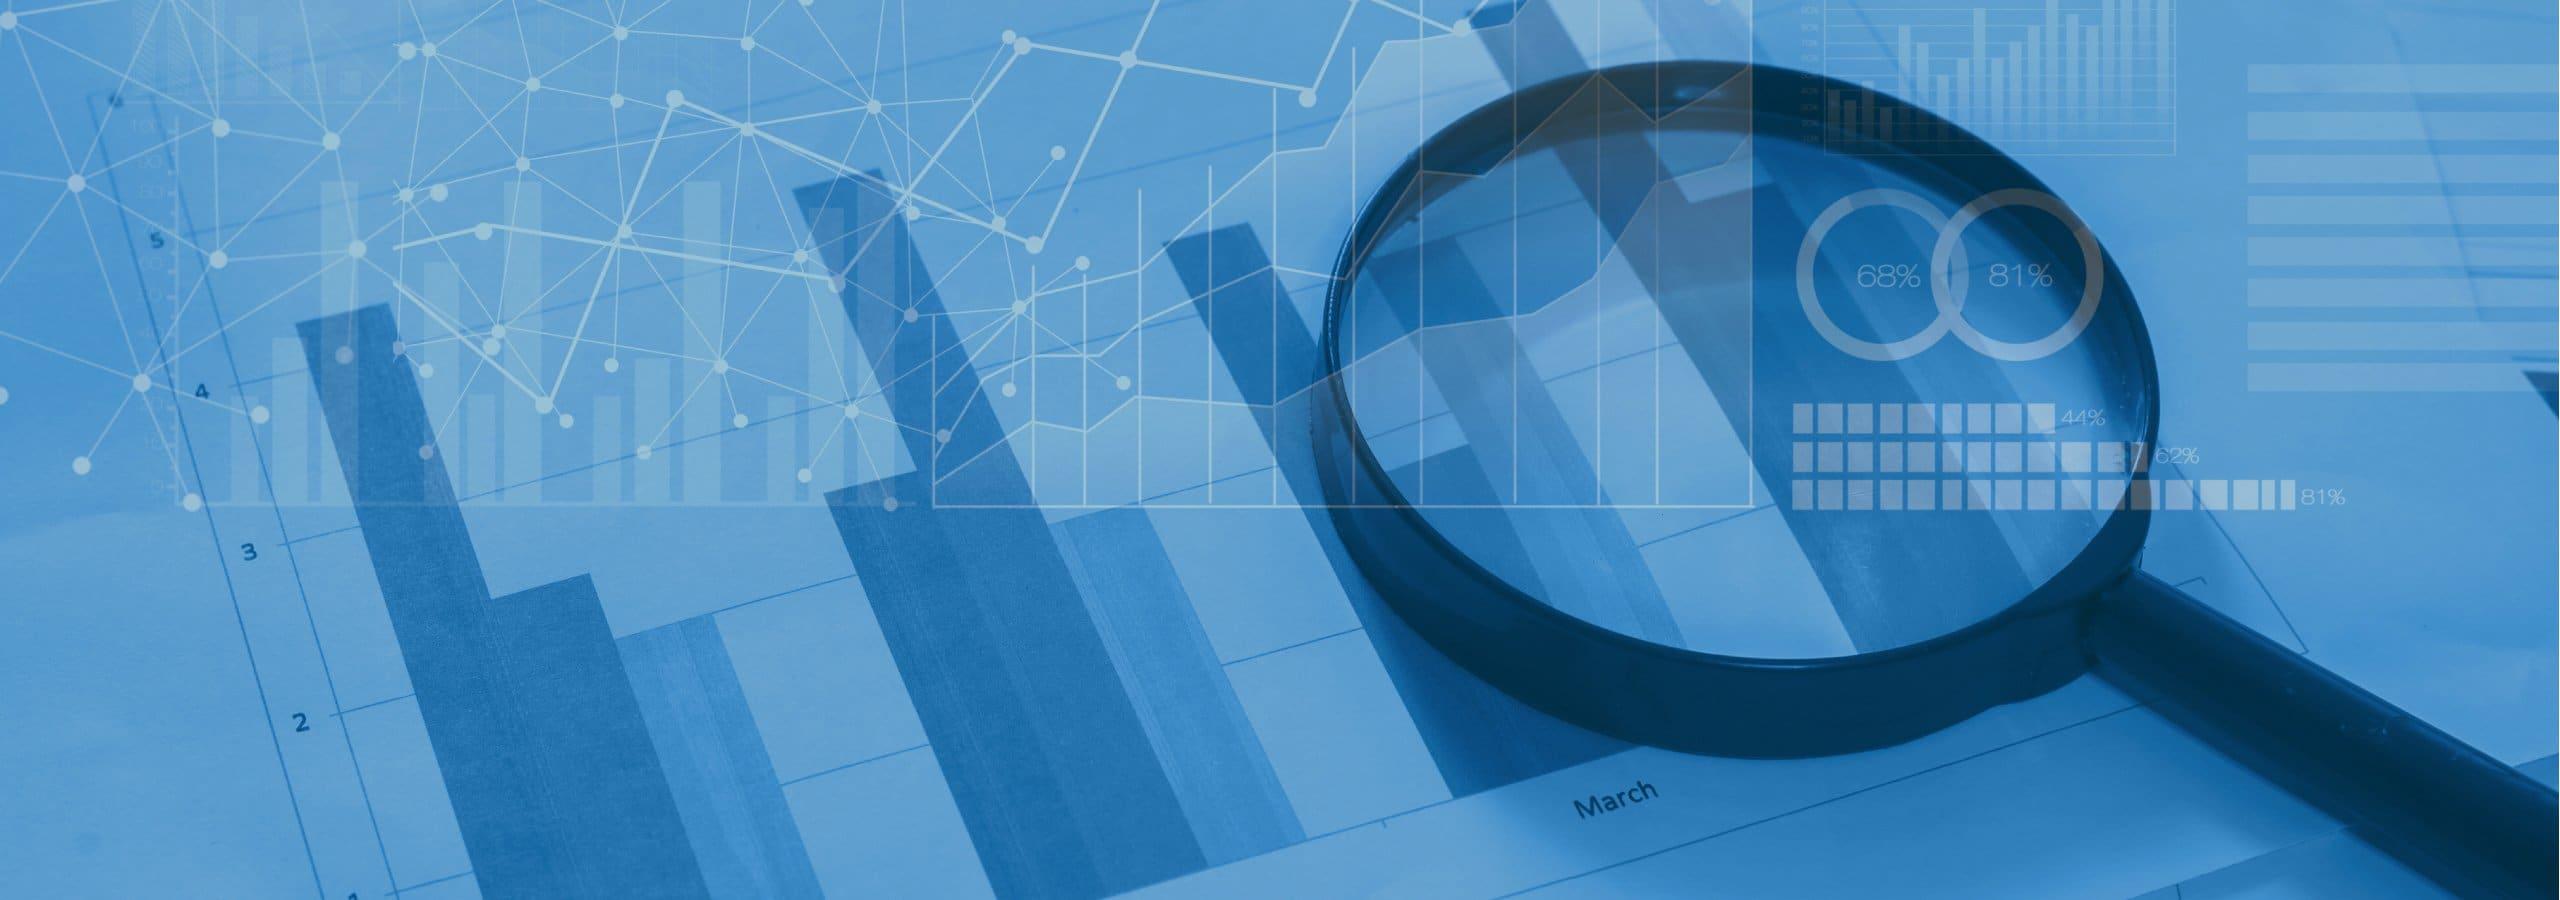 CFO services, få en ny interim CFO på max 10 dage